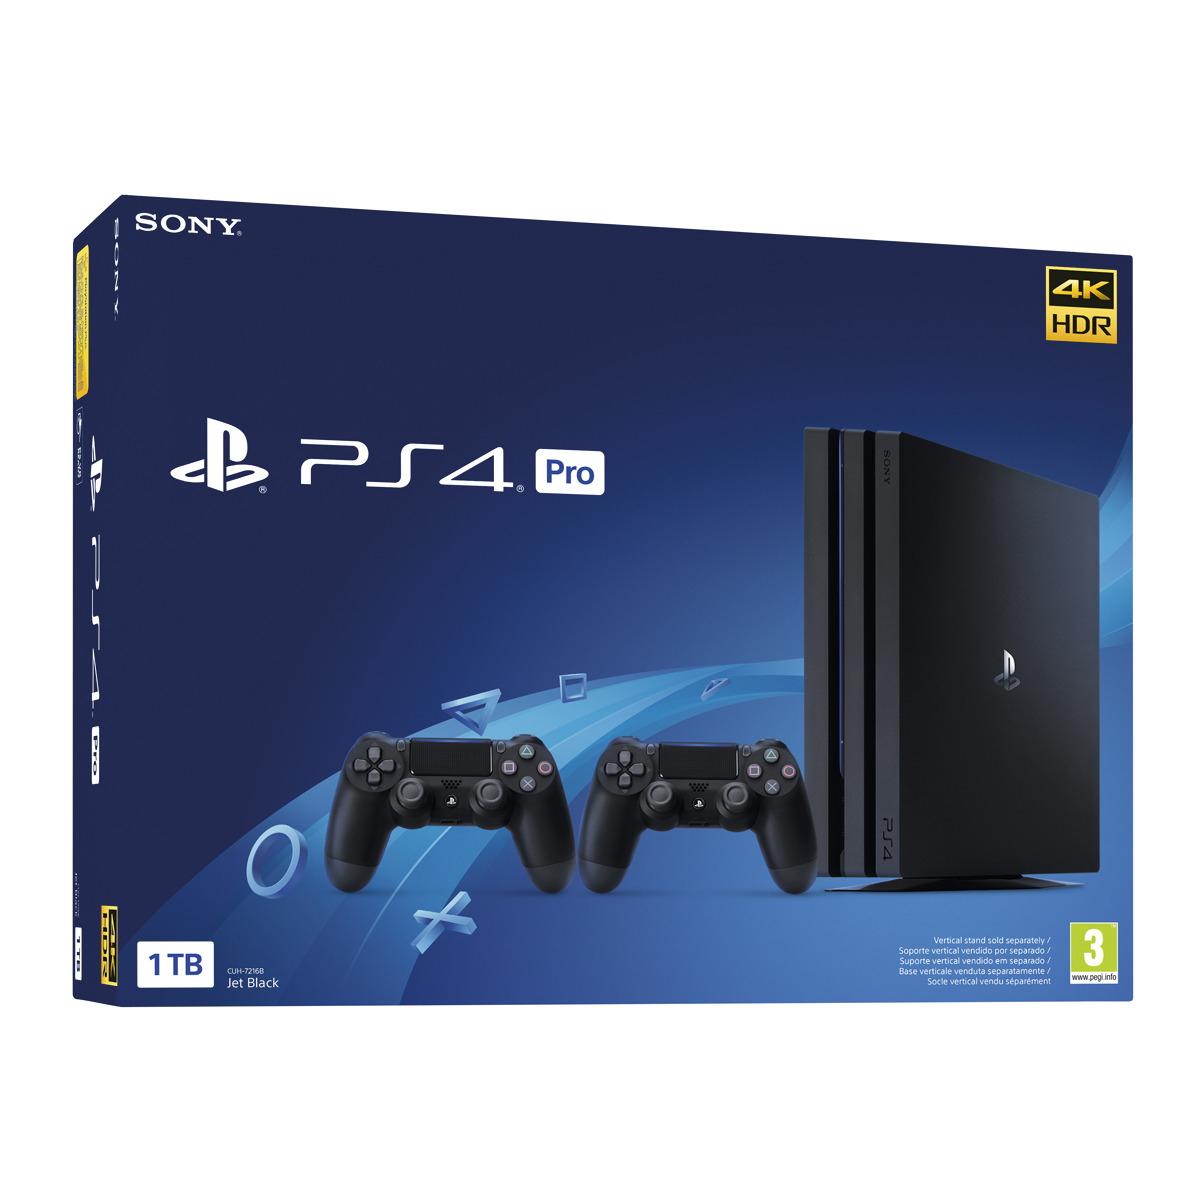 Consola PS4 PRO de 1 TB (Chassis Gamma) + 2 Mandos Dualshock 4